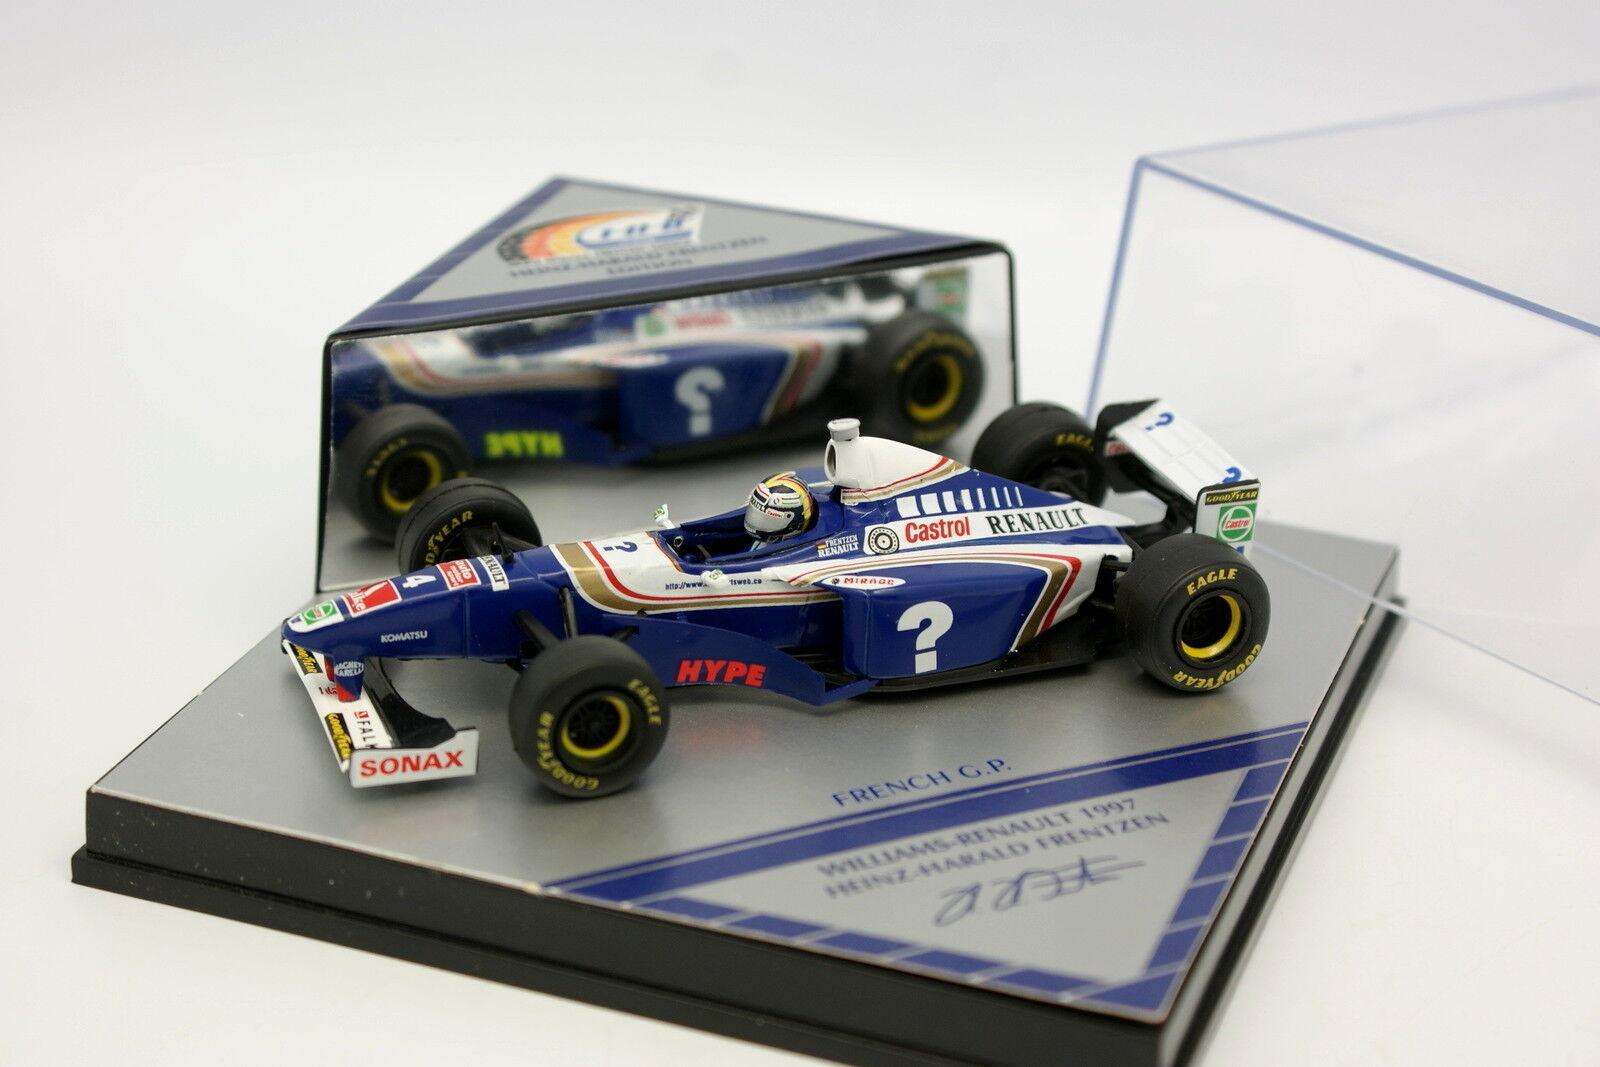 Onyx 1 43 - - - F1 Williams Renault 1997 French GP Frentzen babae5